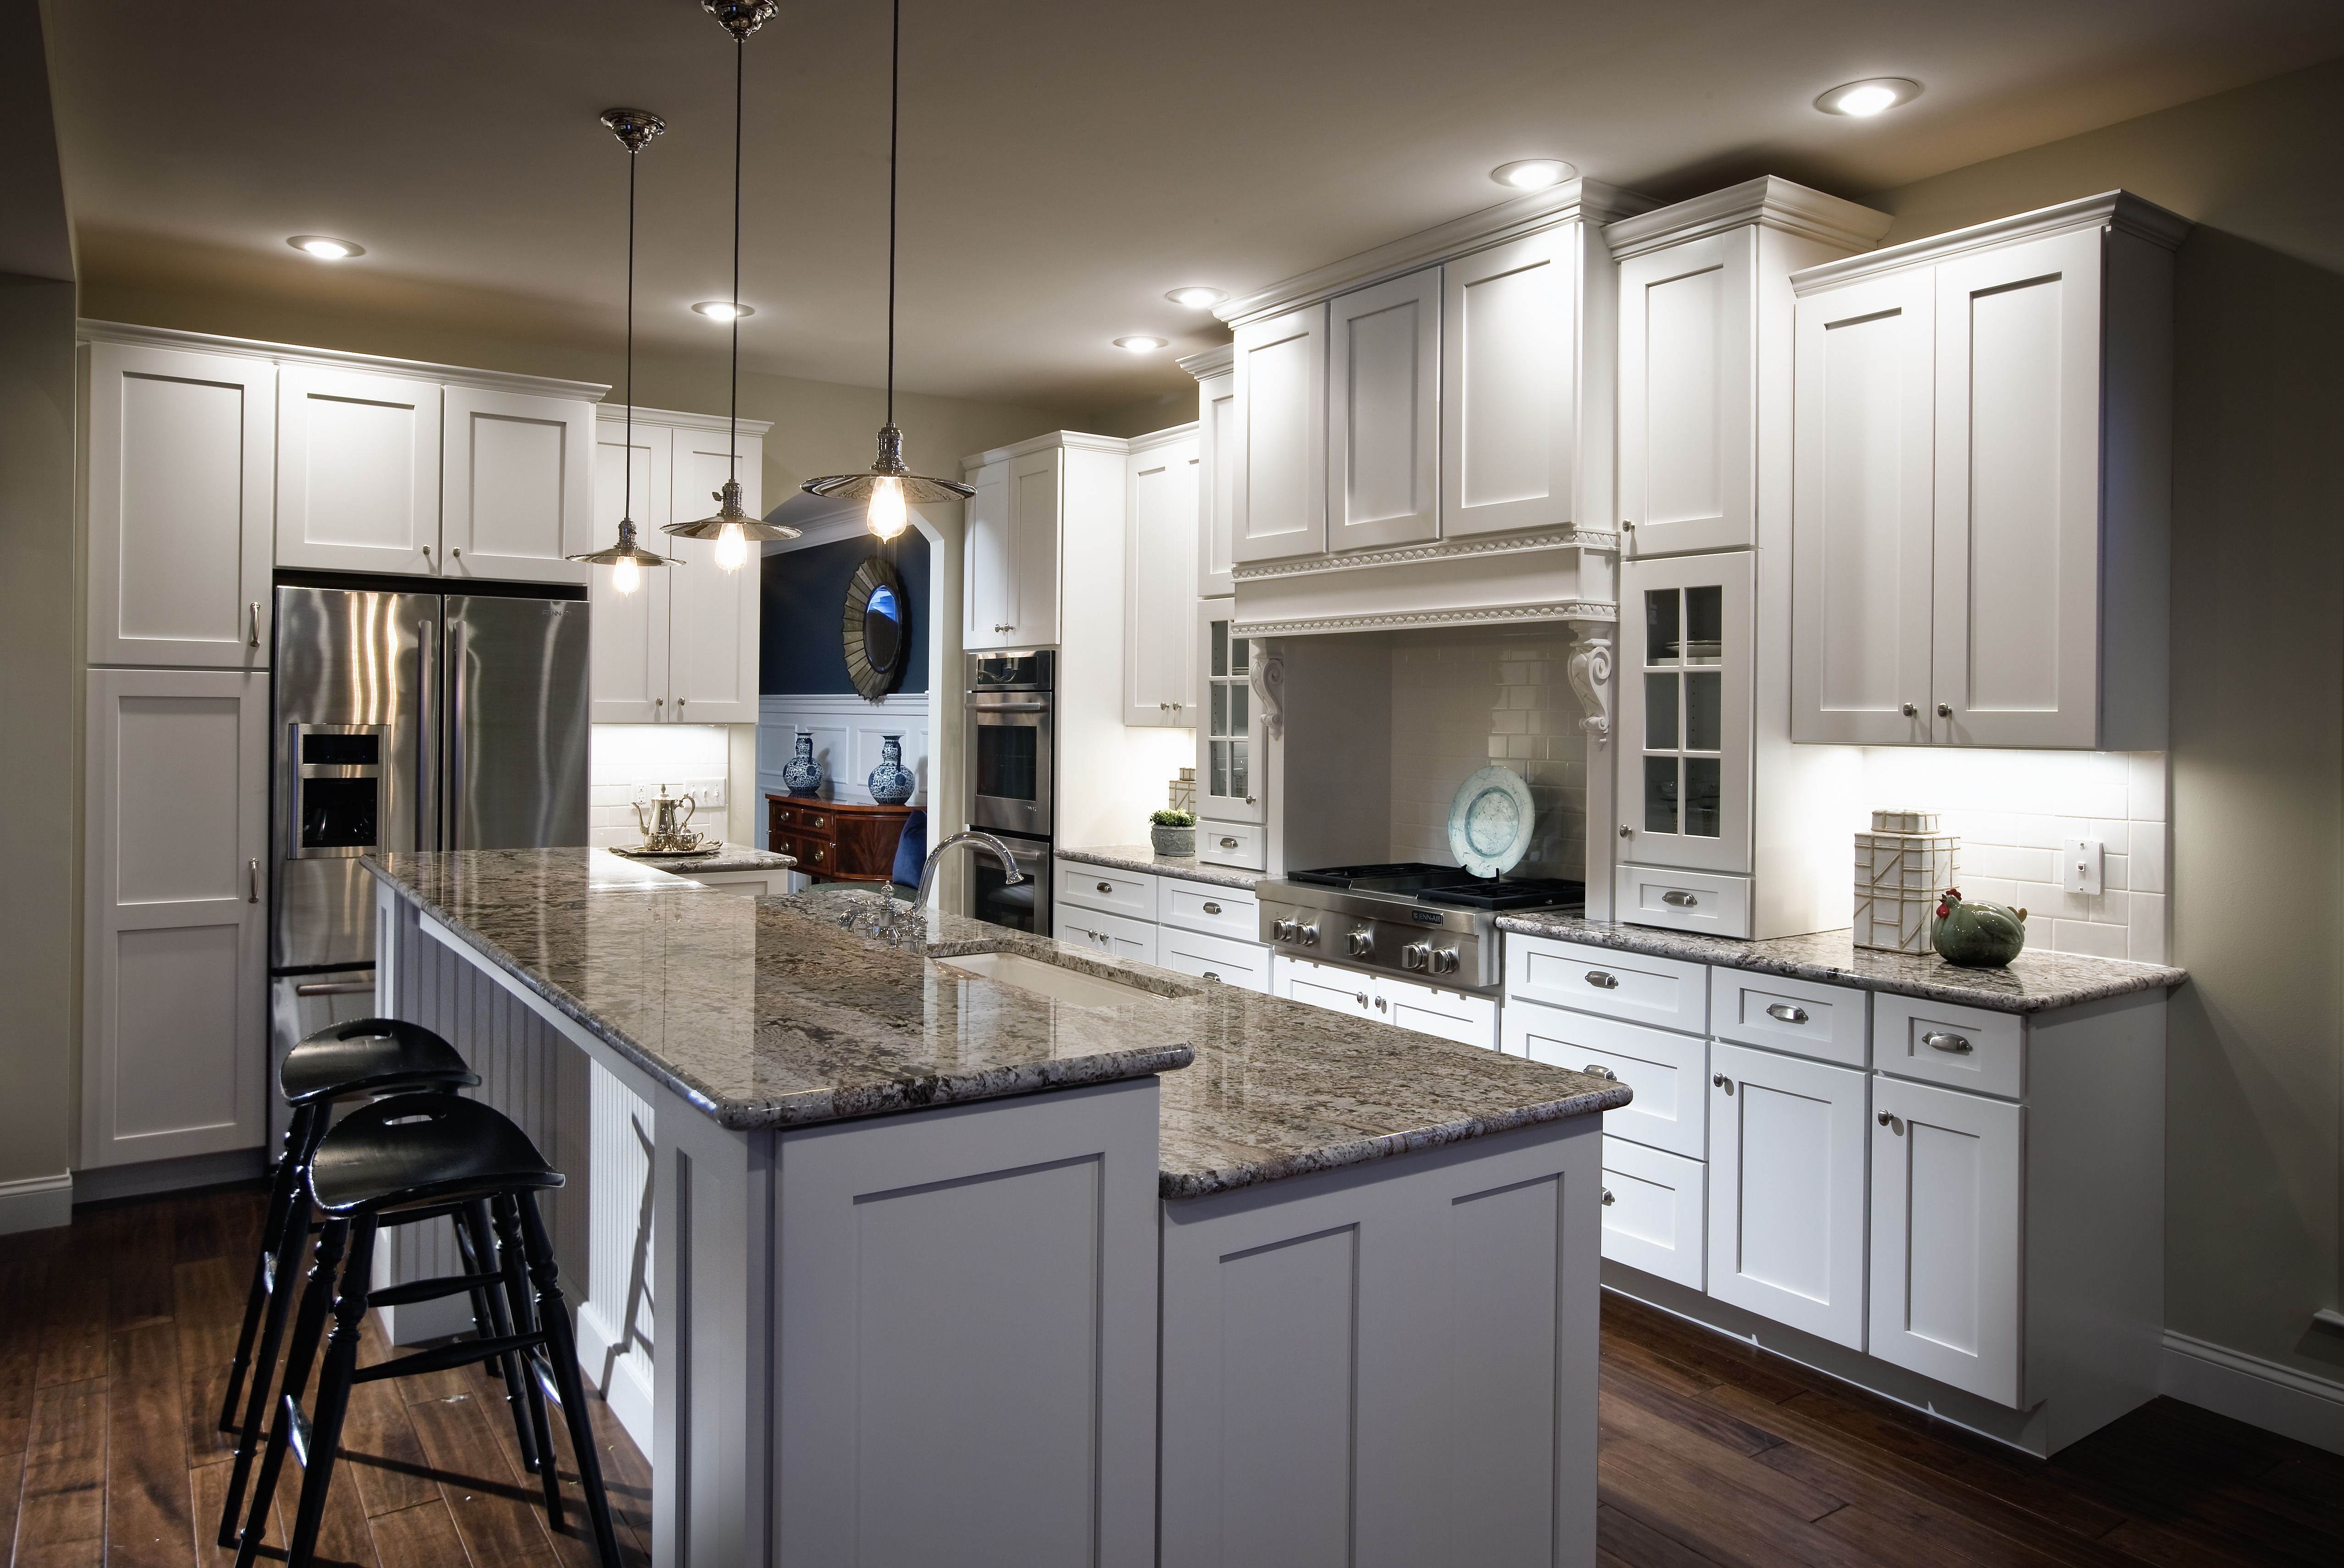 Two Level Kitchen Island Plans | http://navigator-spb.info ...